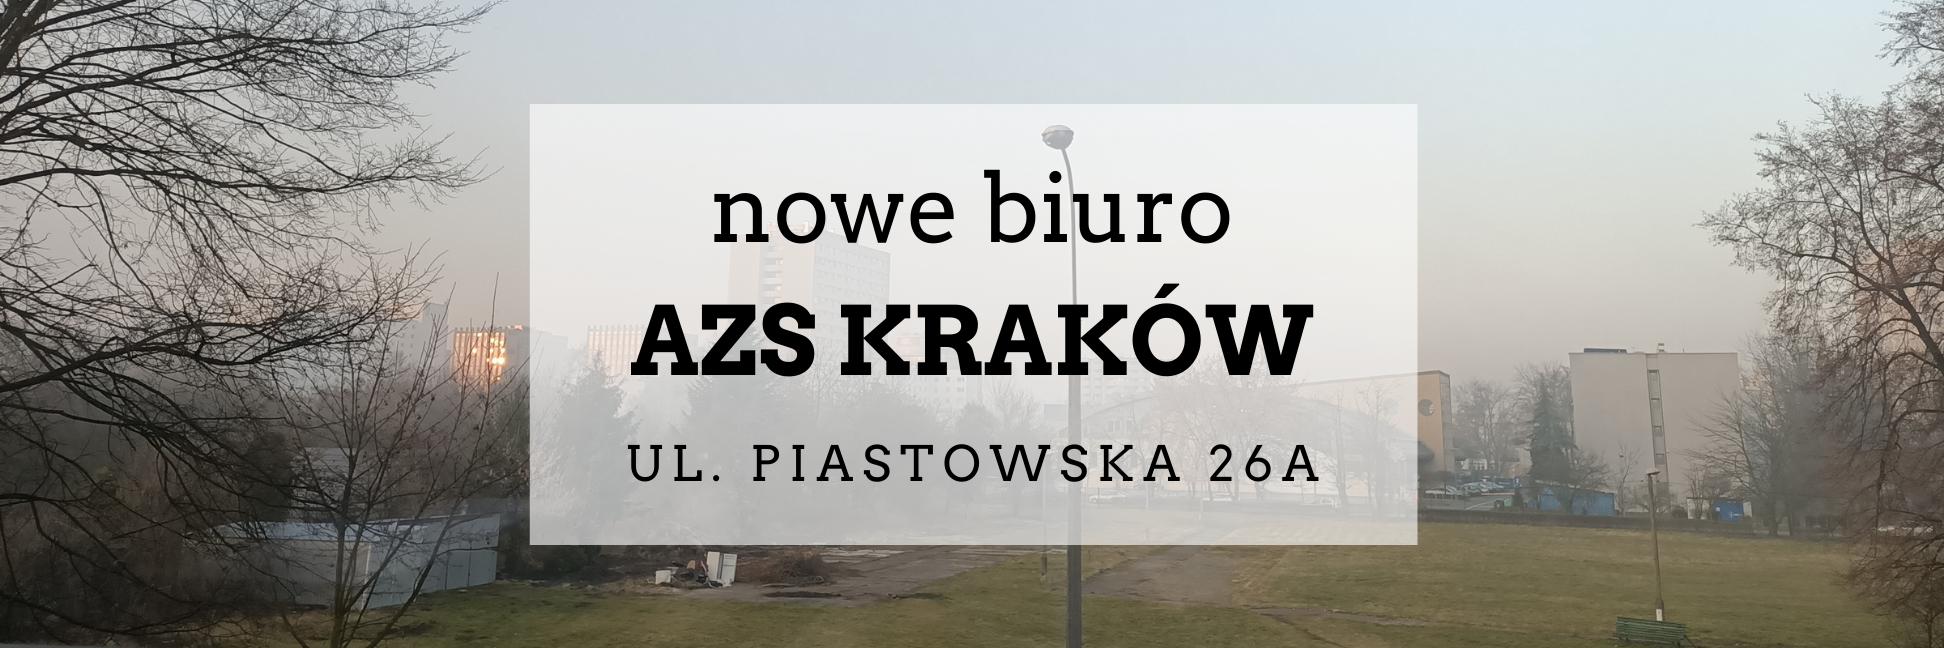 Piastowska 26a AZS KRAKÓW biuro